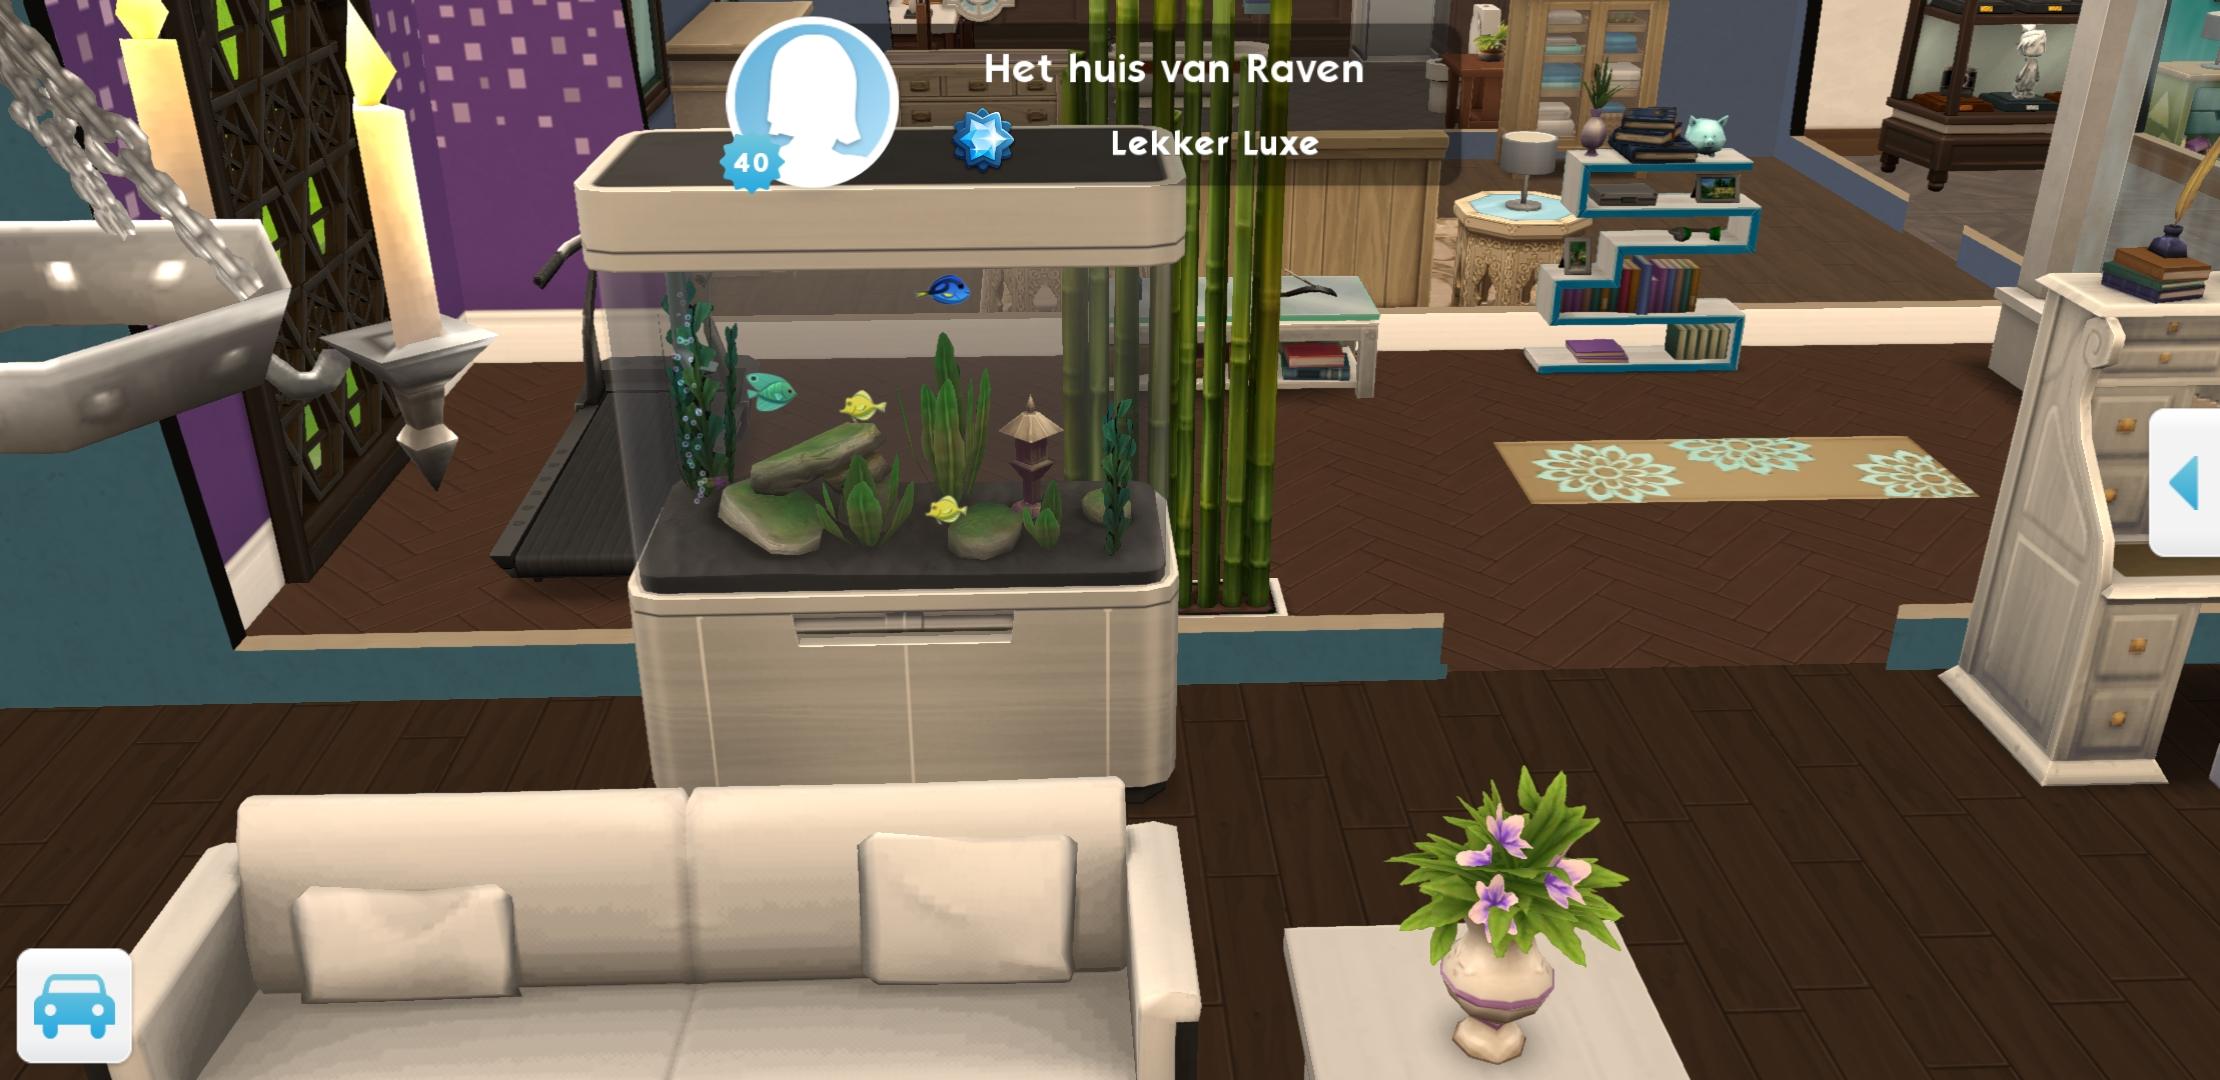 Screenshot_20180626_173014_The_Sims.jpg